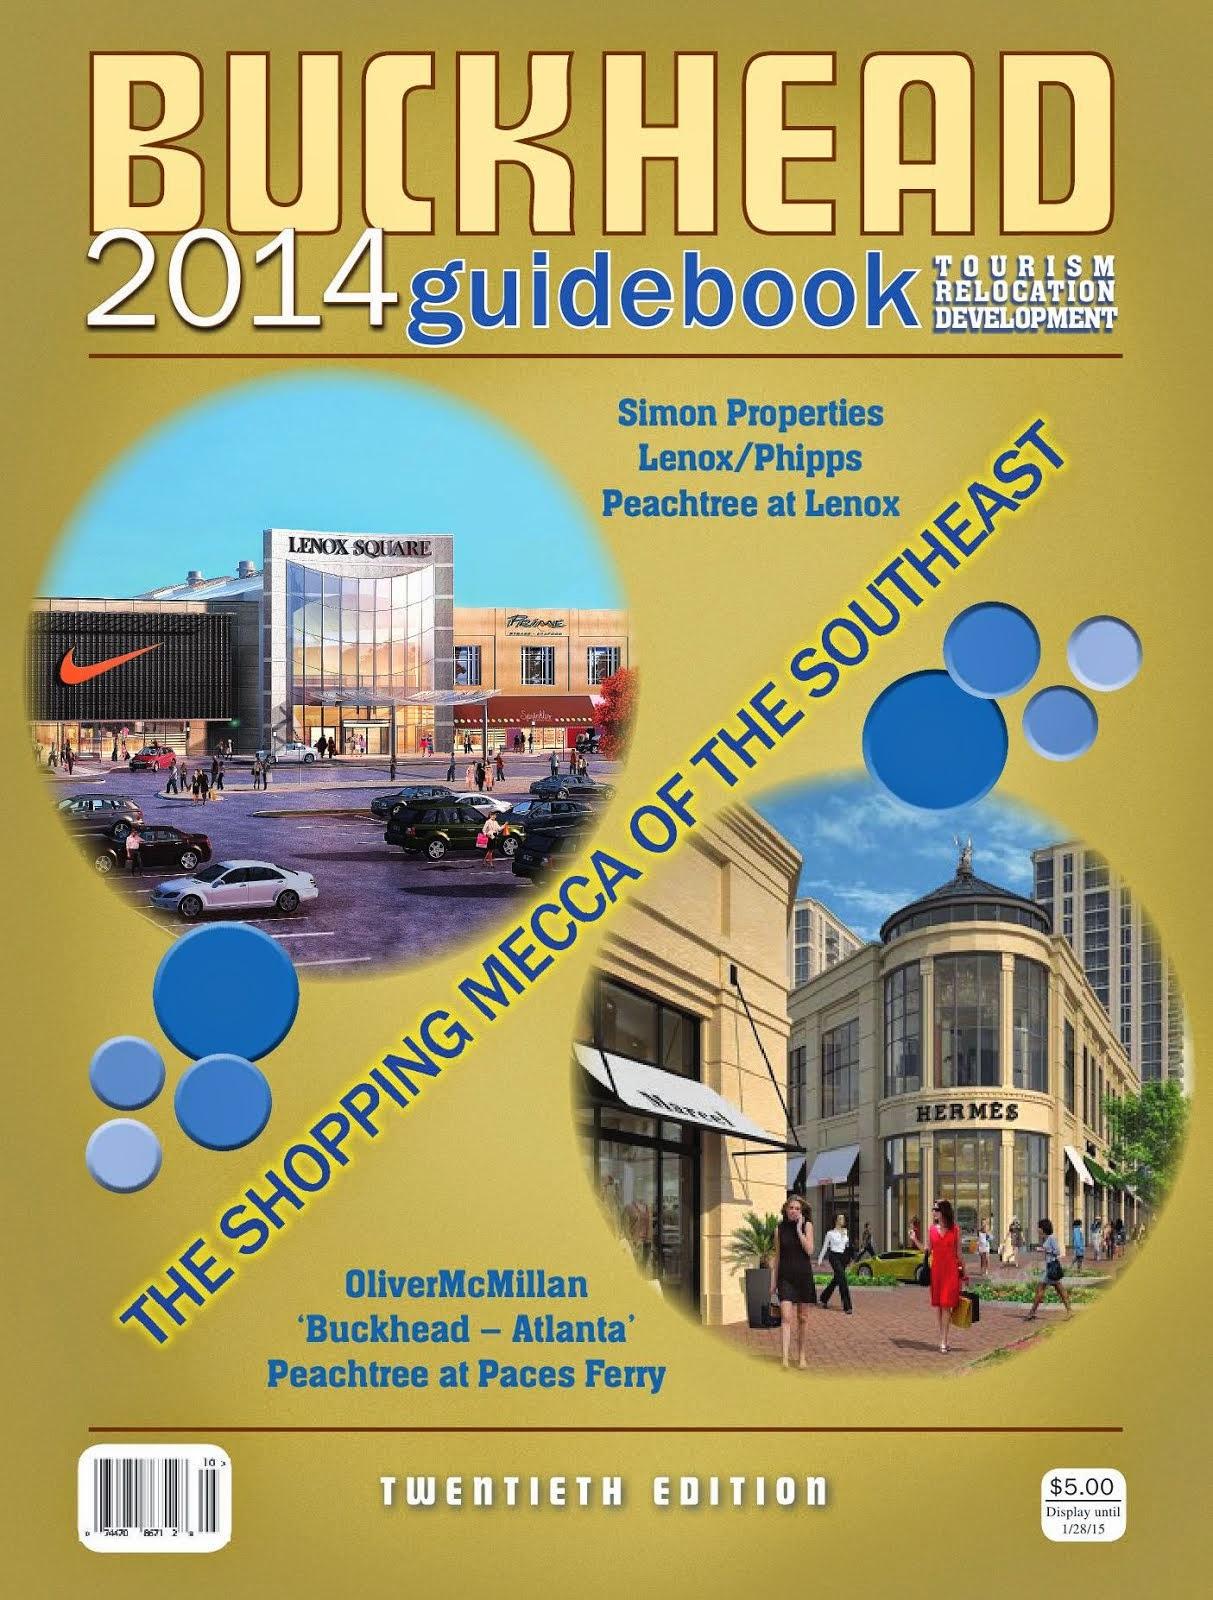 Buckhead Guidebook